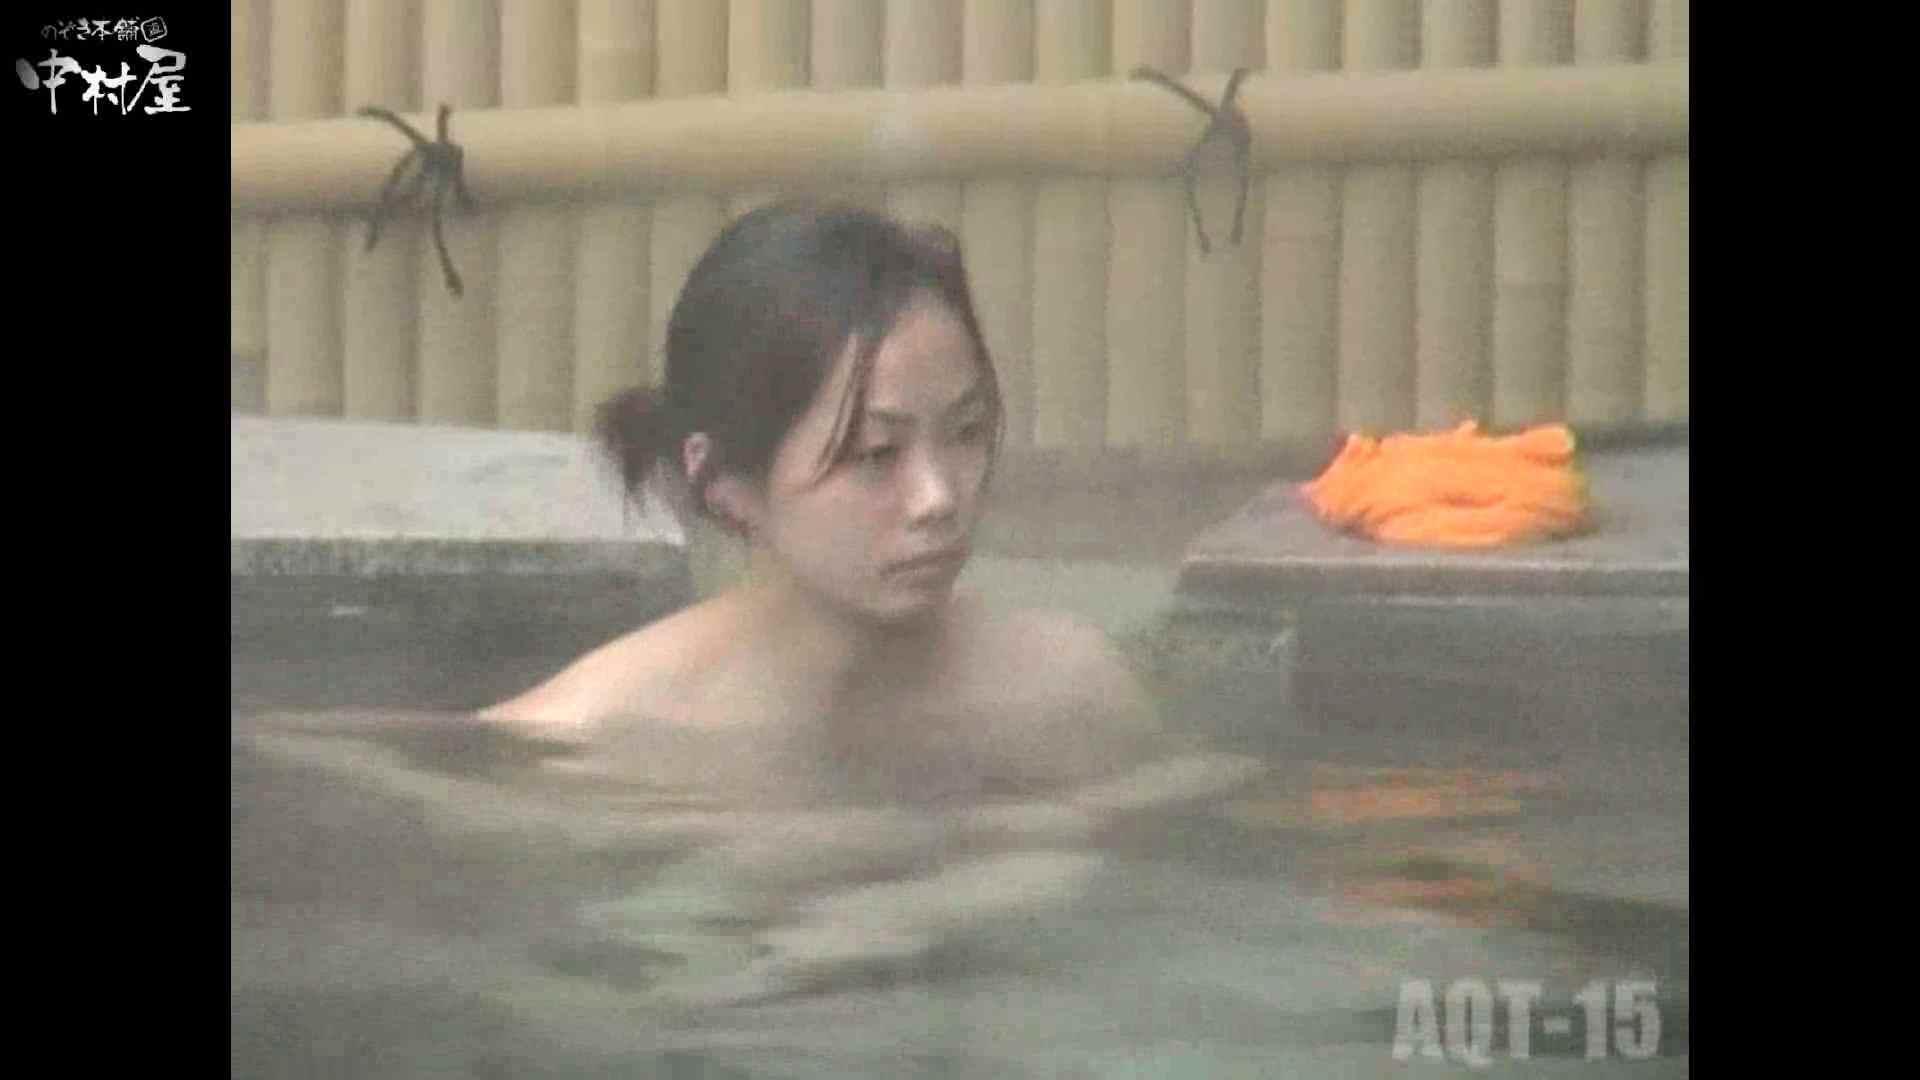 Aquaな露天風呂Vol.878潜入盗撮露天風呂十五判湯 其の八 盗撮 | HなOL  81pic 60